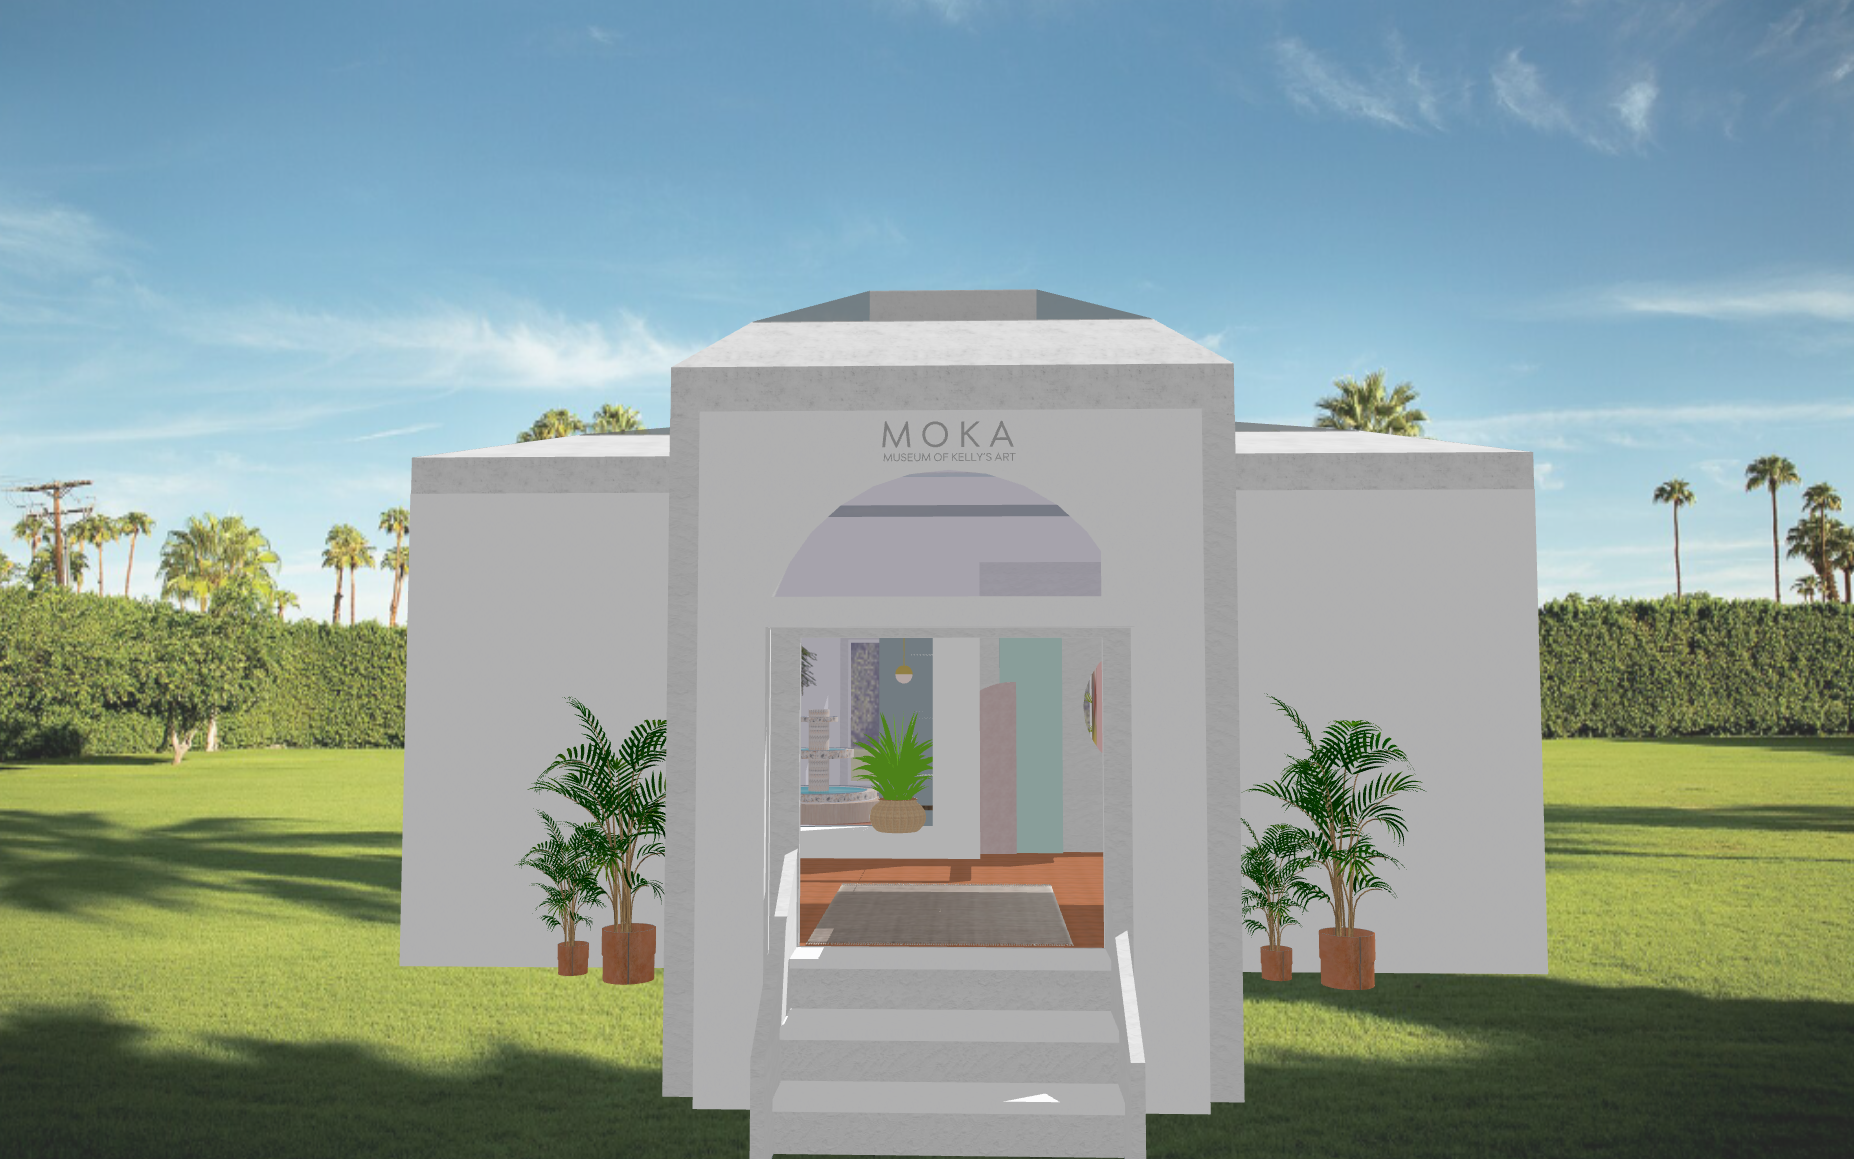 MOKA-virtual museum-3d rendering-1